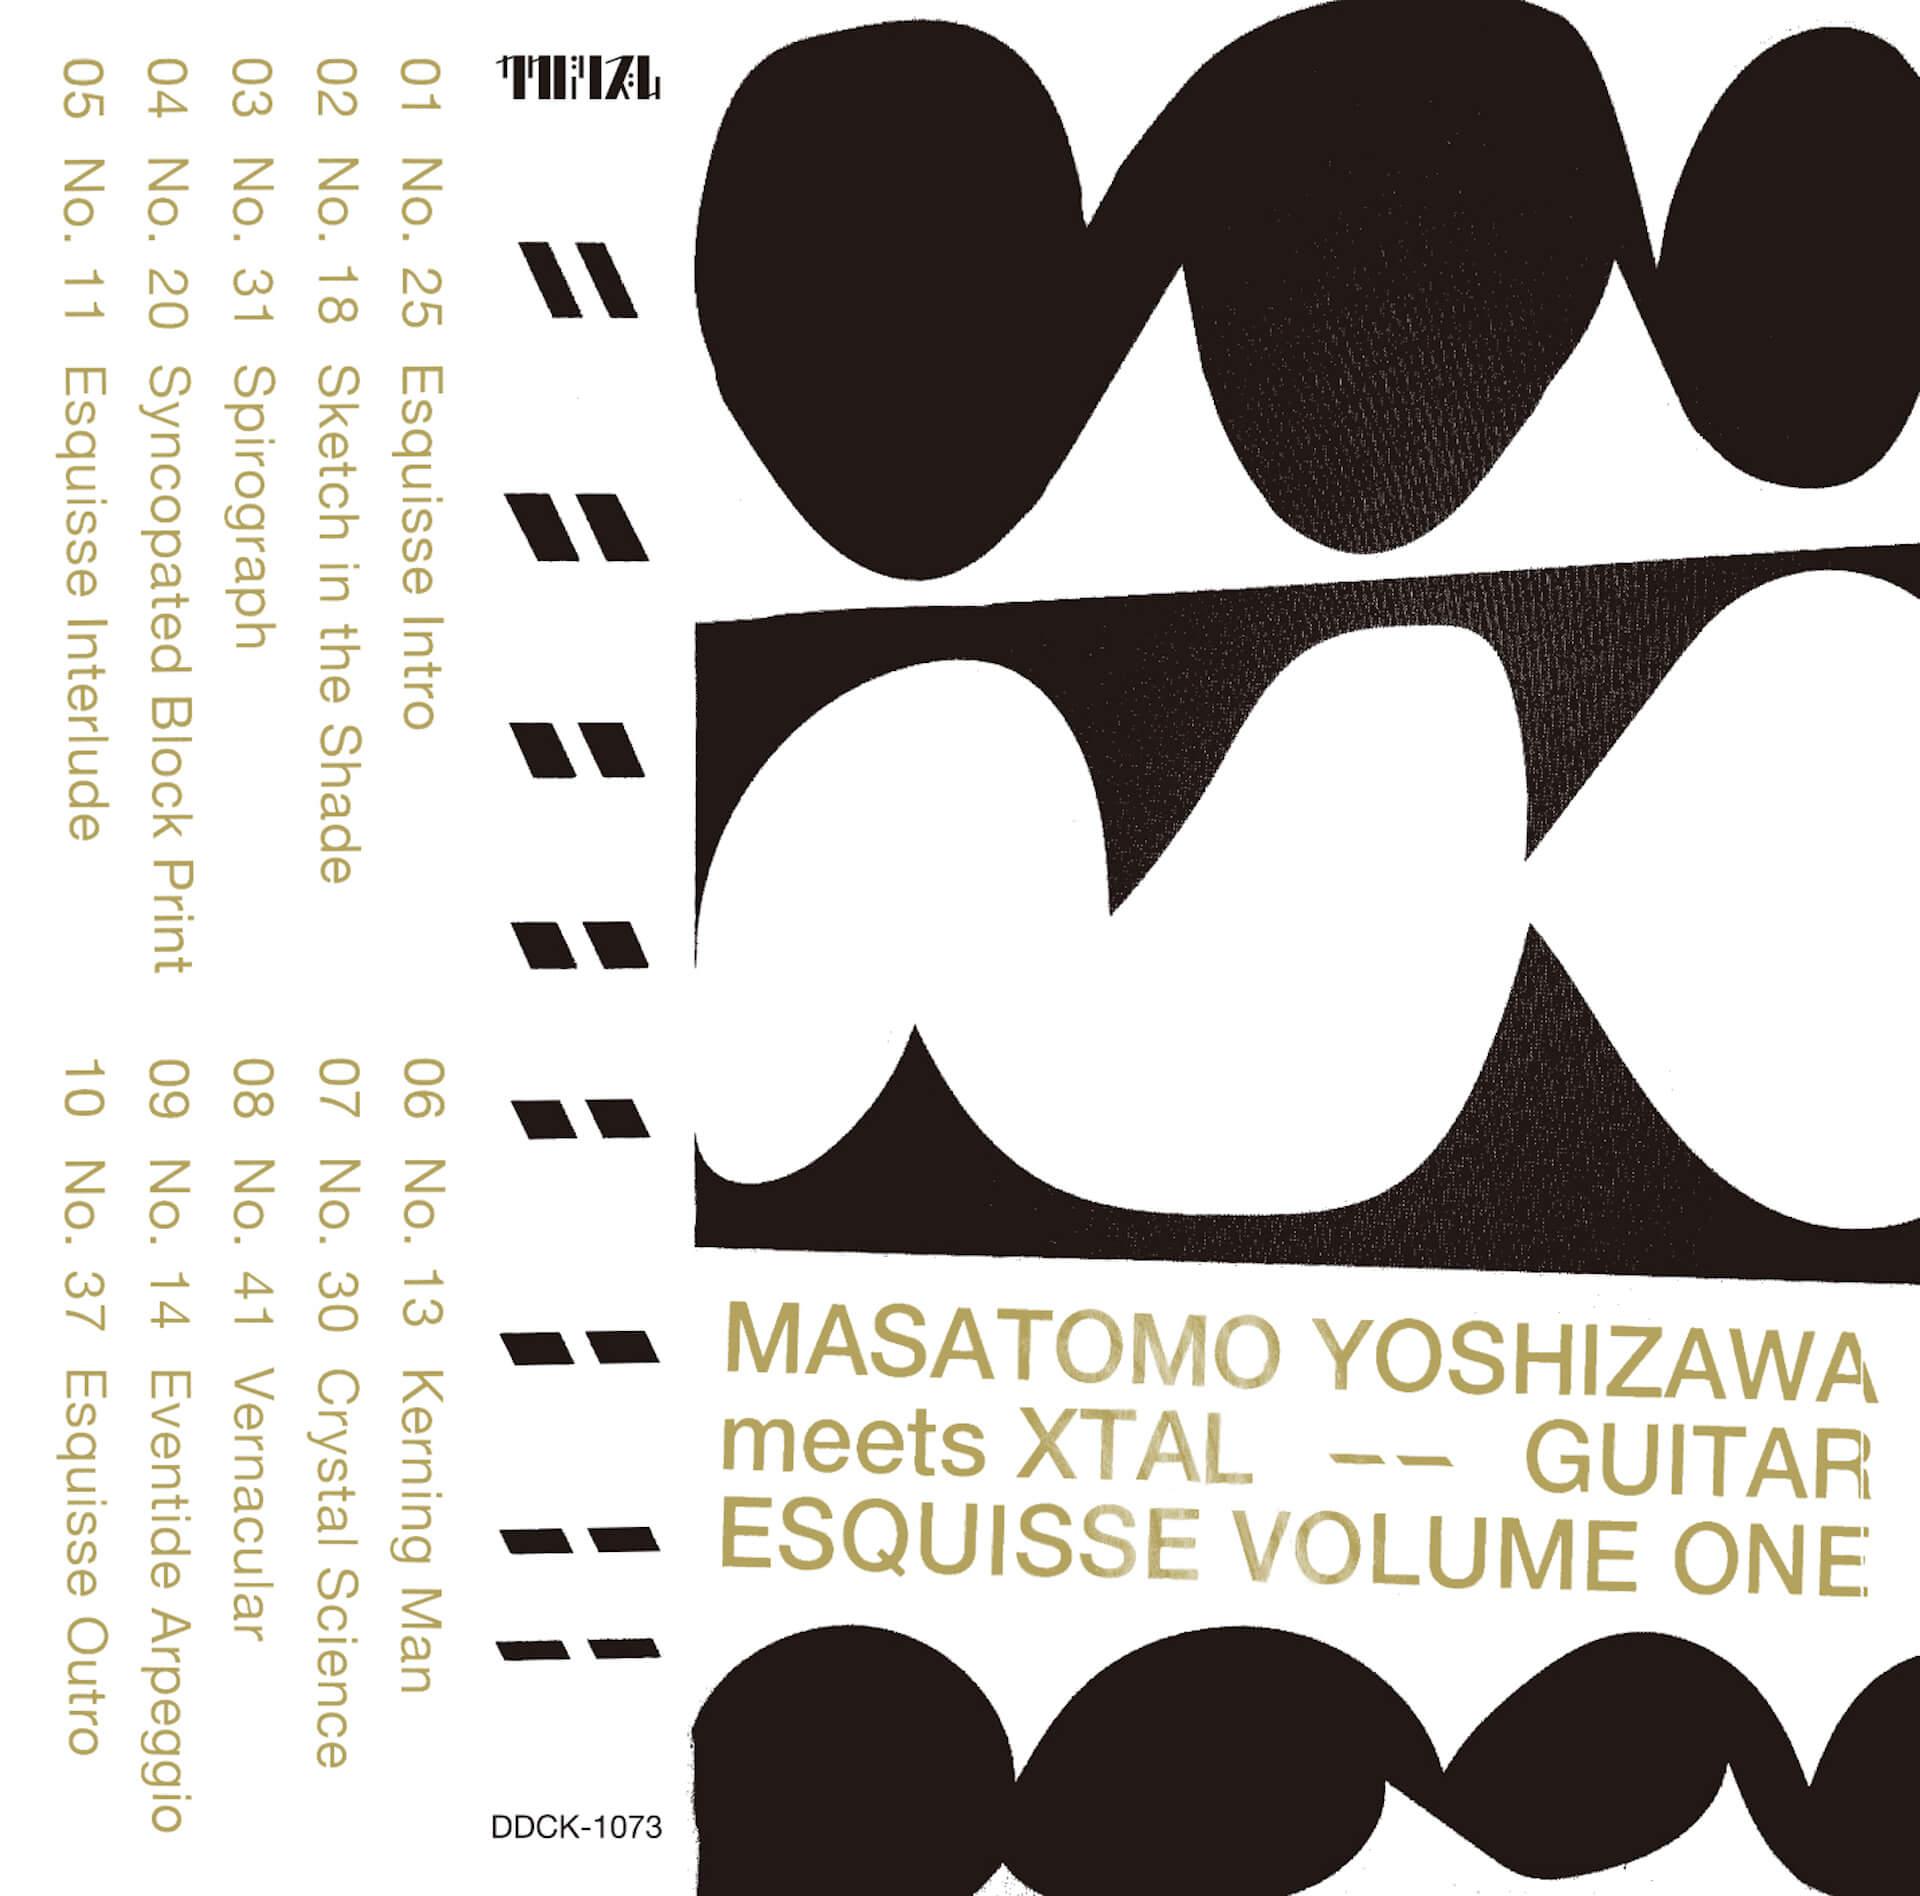 YOUR SONG IS GOODのGt吉澤成友初のソロ作『Guitar Esquisse Volume One』がリリース決定! music_210721_masatoyoshizawa2